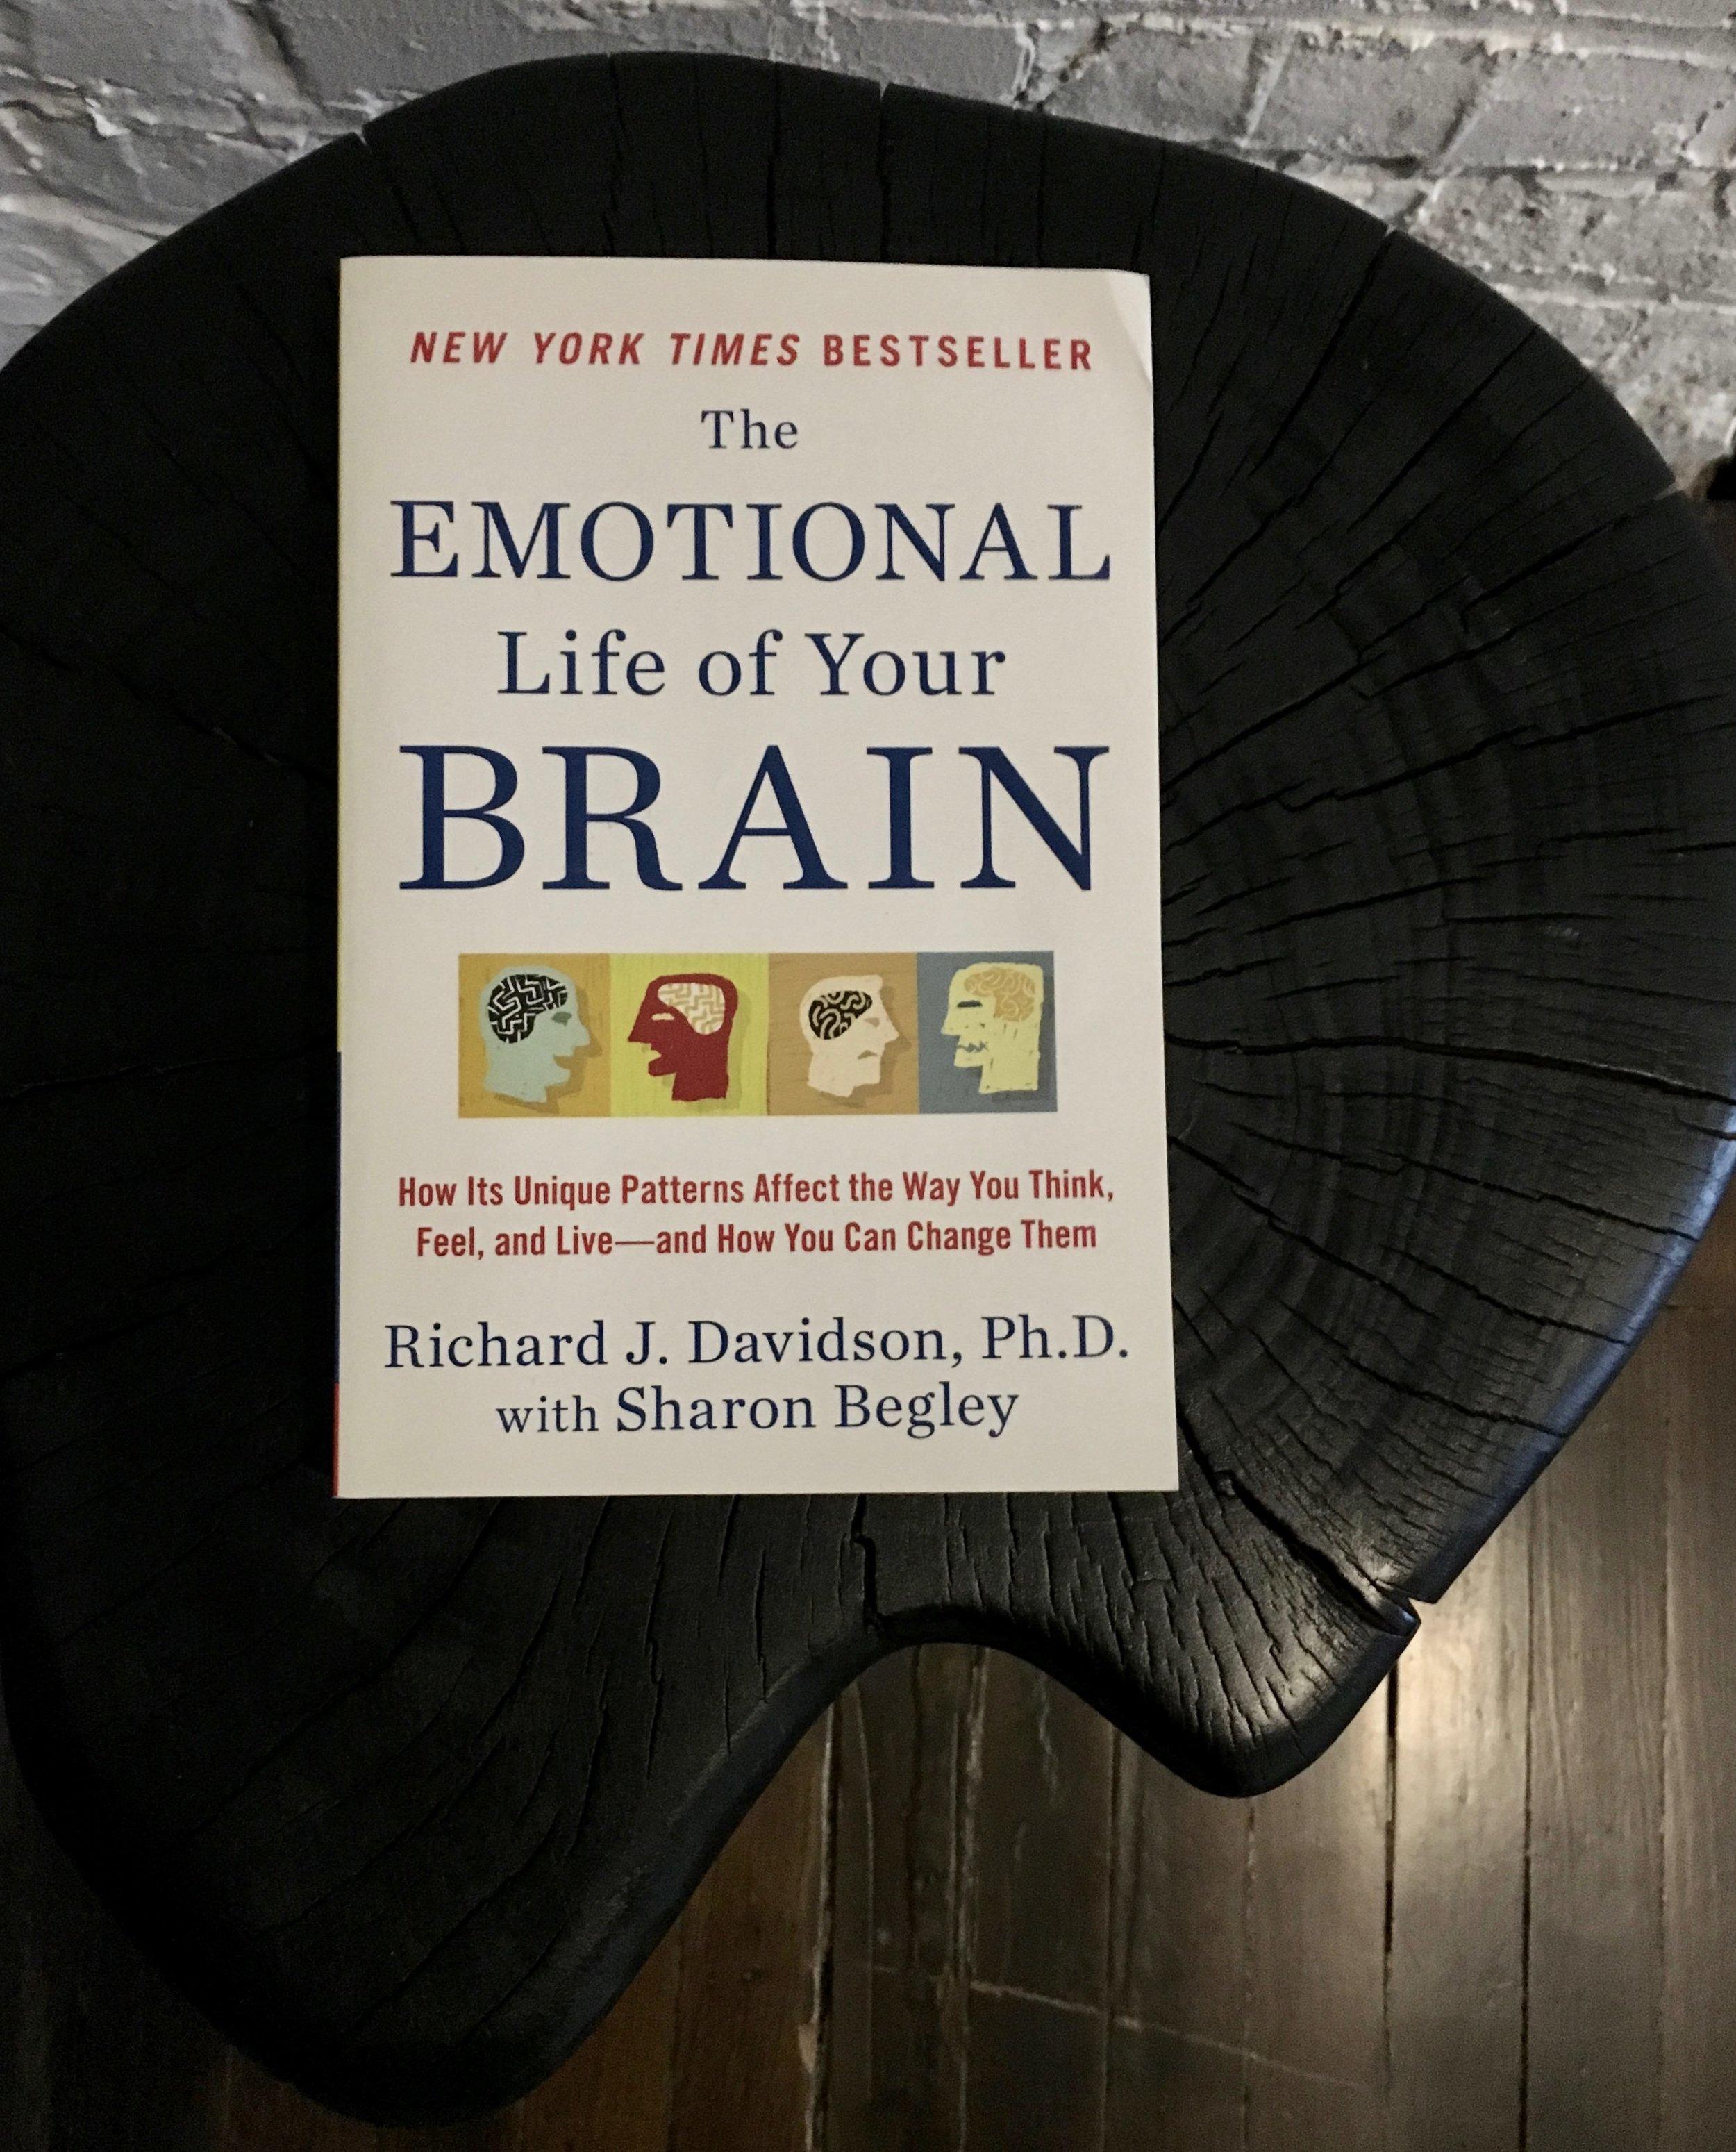 richard_davidson_meditation_book_chill_chicago_mini.jpg